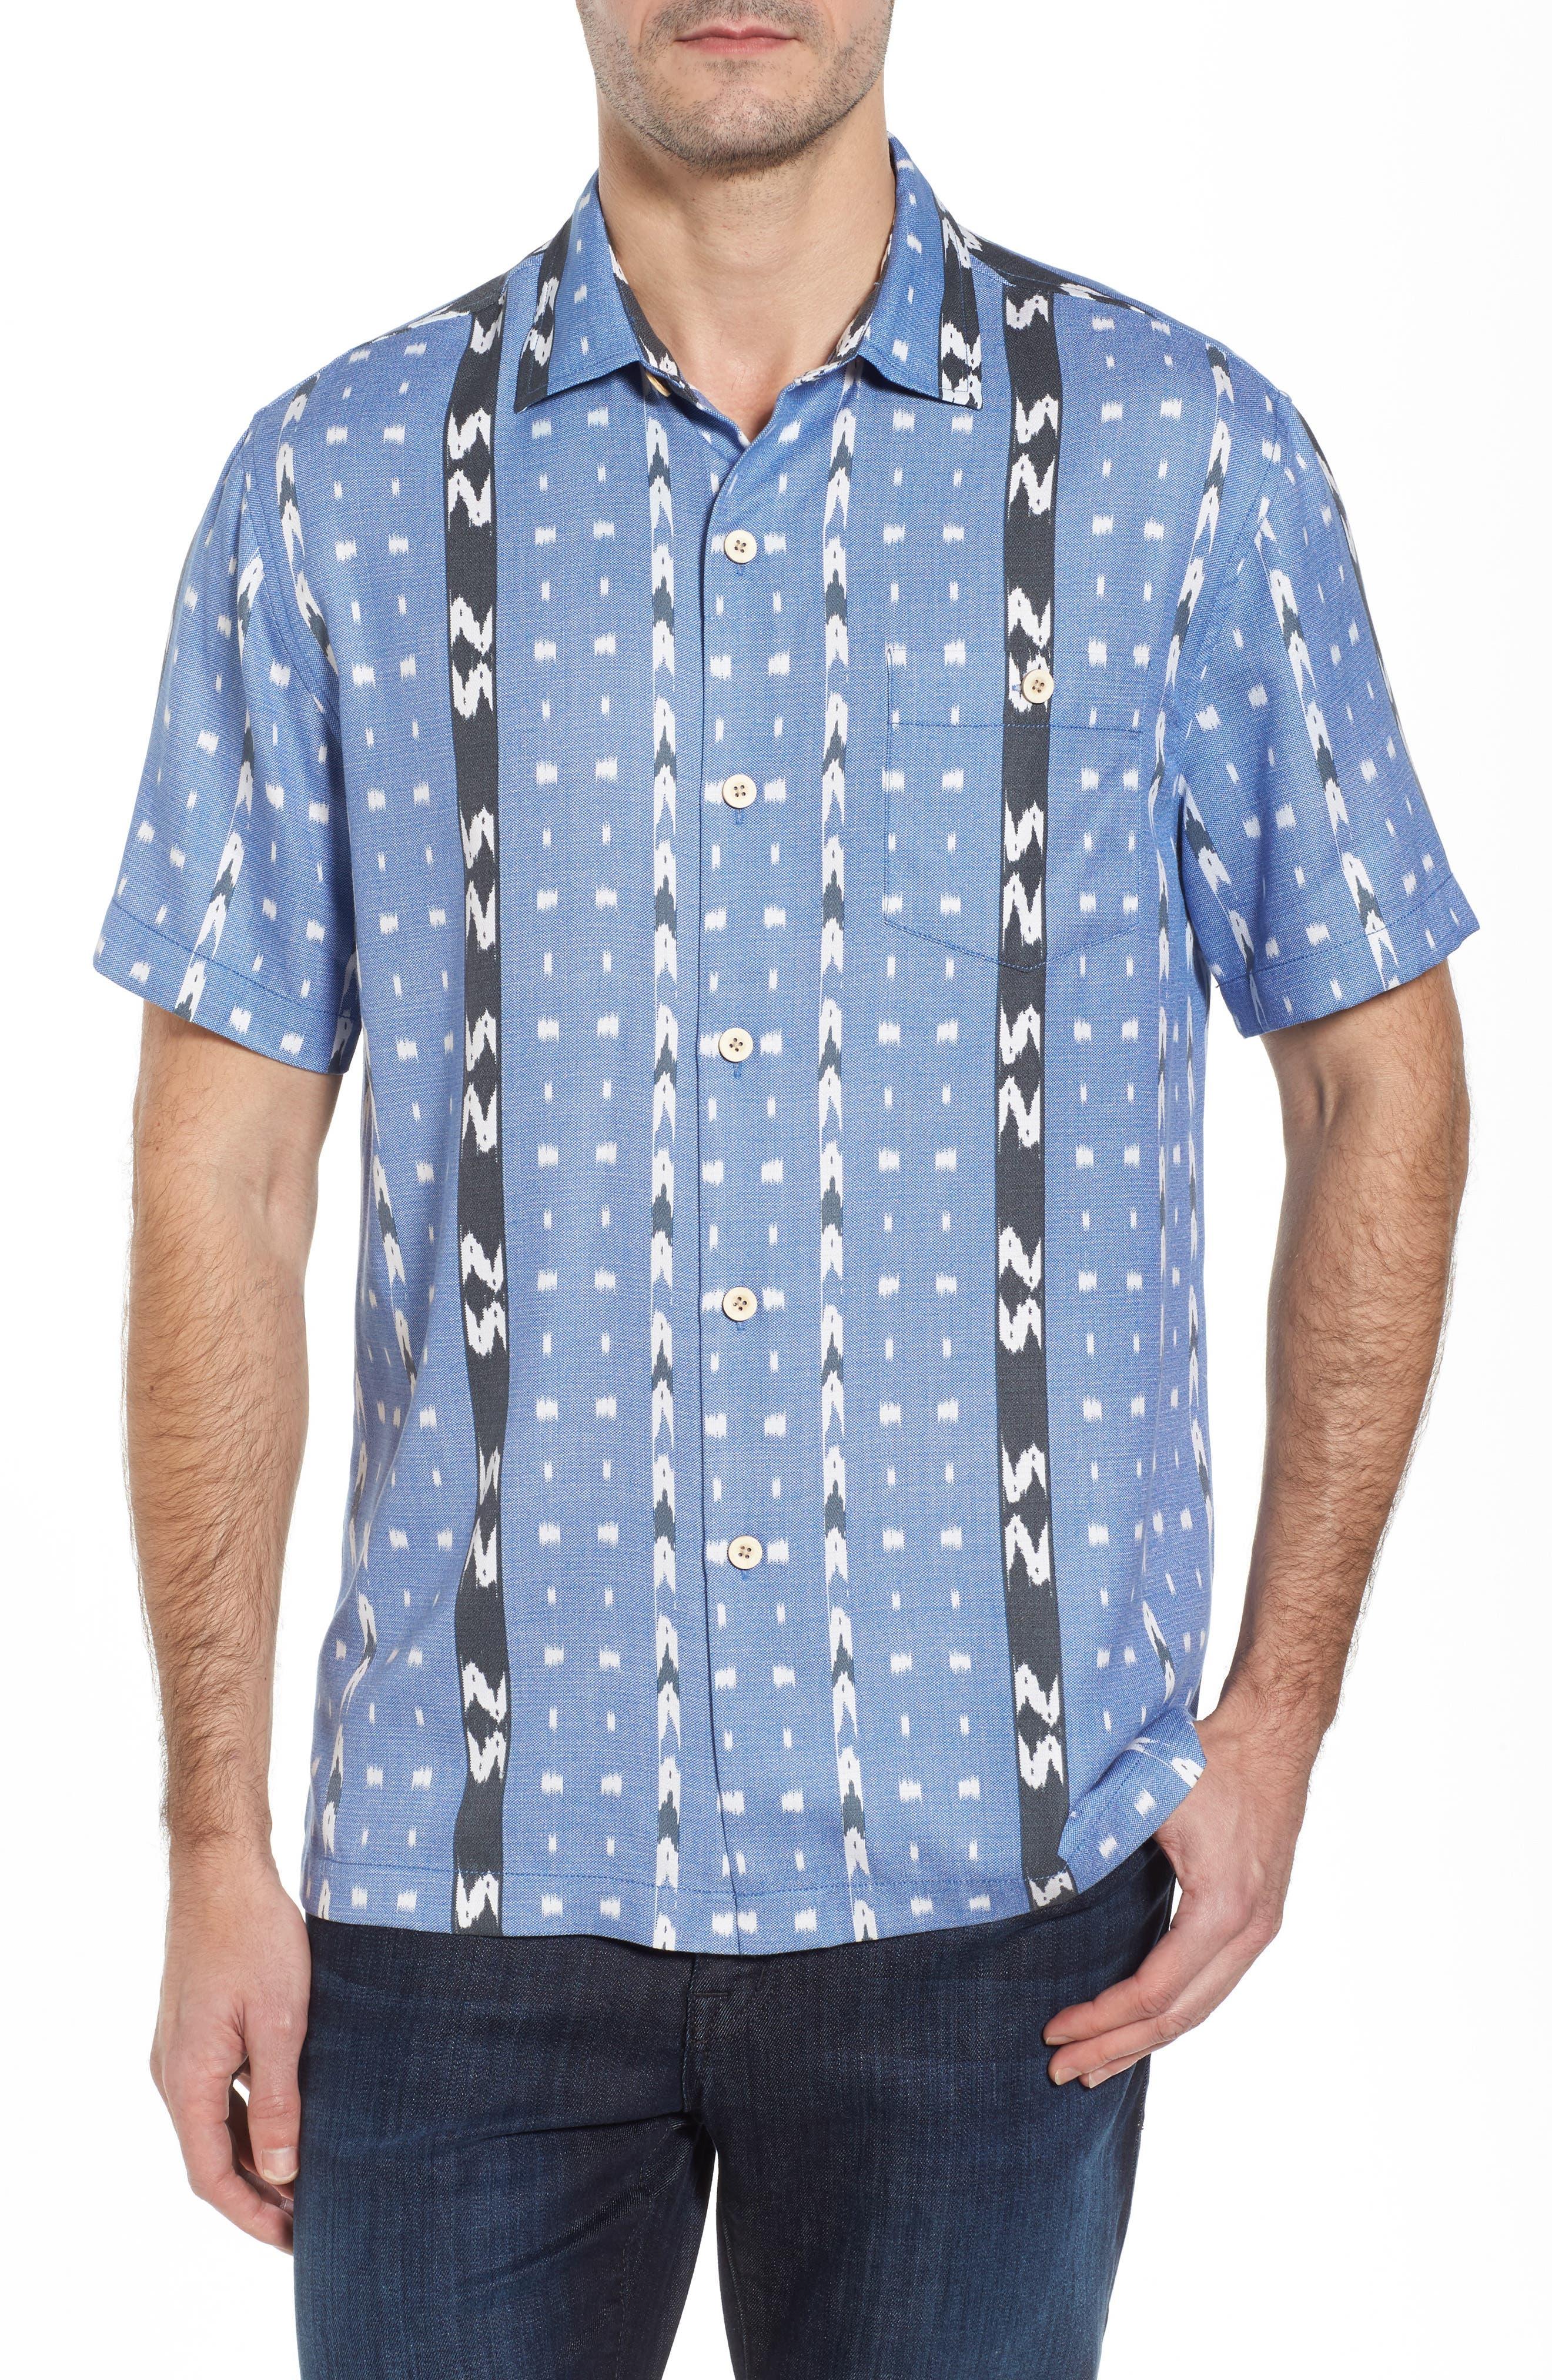 Main Image - Tommy Bahama Ikat Don't Stop Silk Blend Camp Shirt